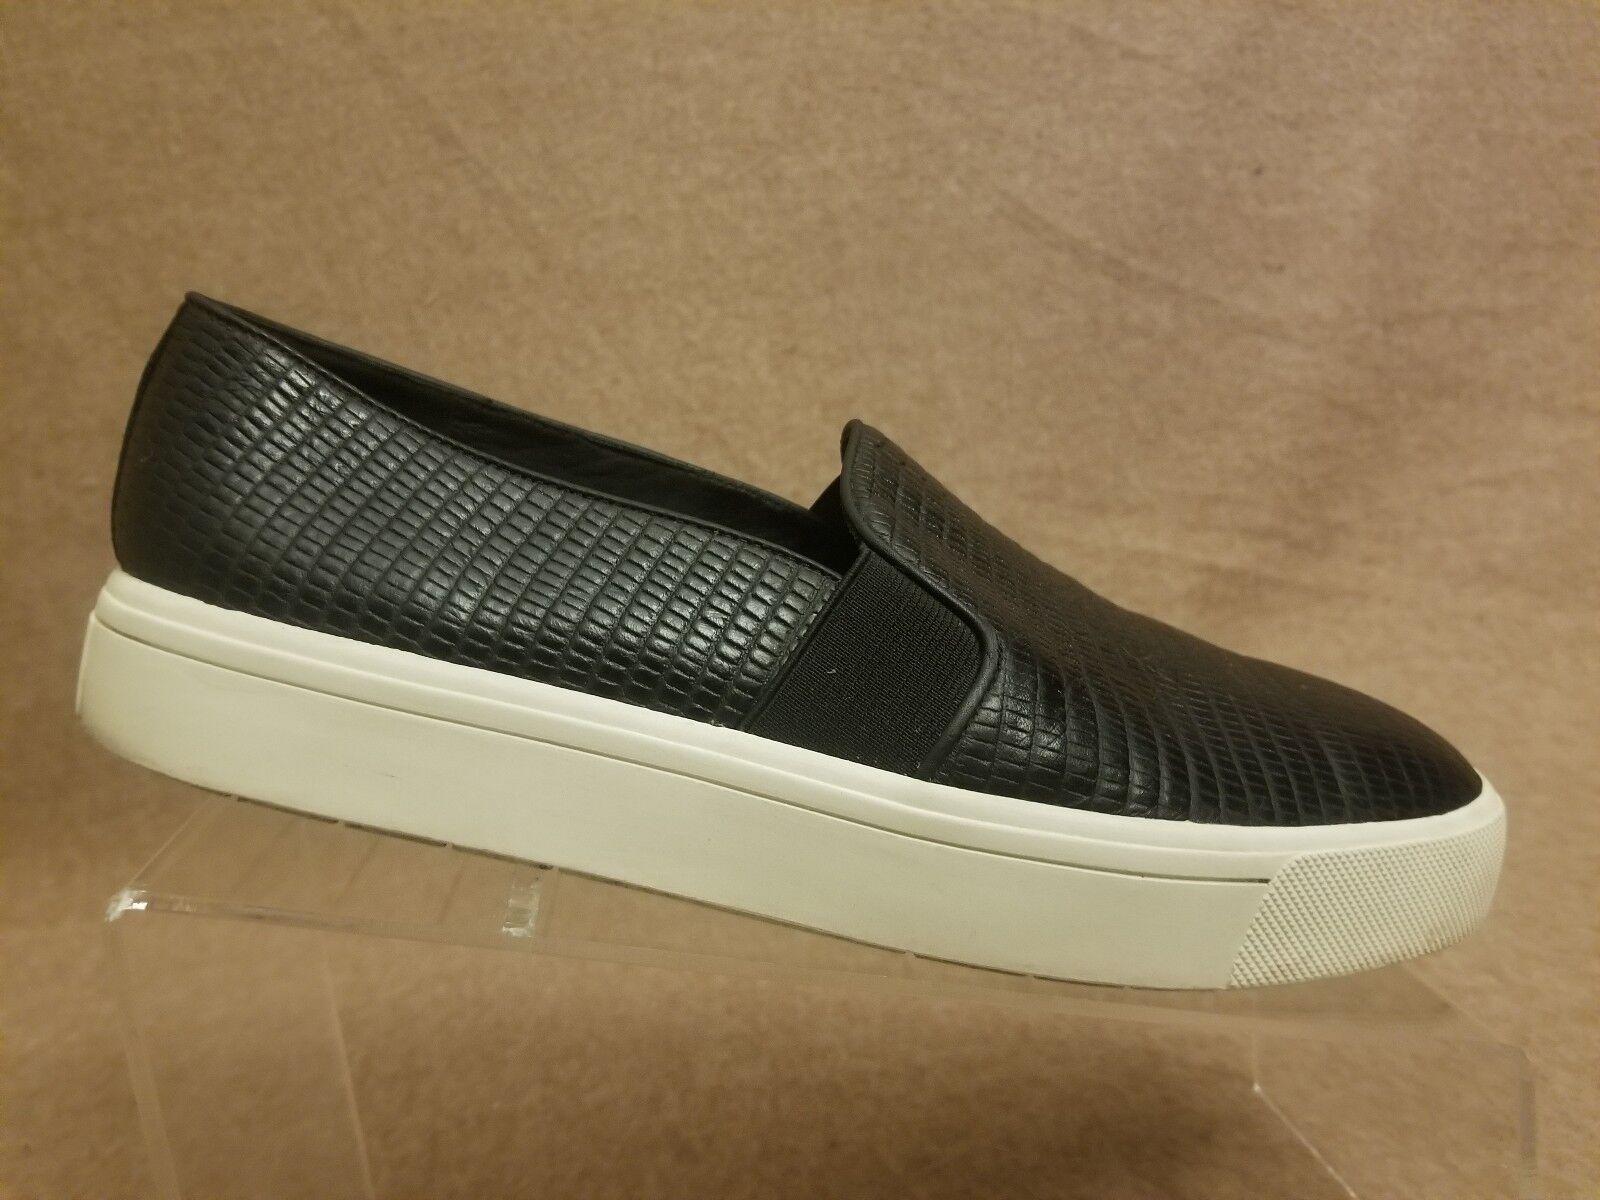 Vince Women shoes Black Flats Leather Snake Print Slip Slip Slip On Loafers Sz 8.5 M  38.5 3eca98